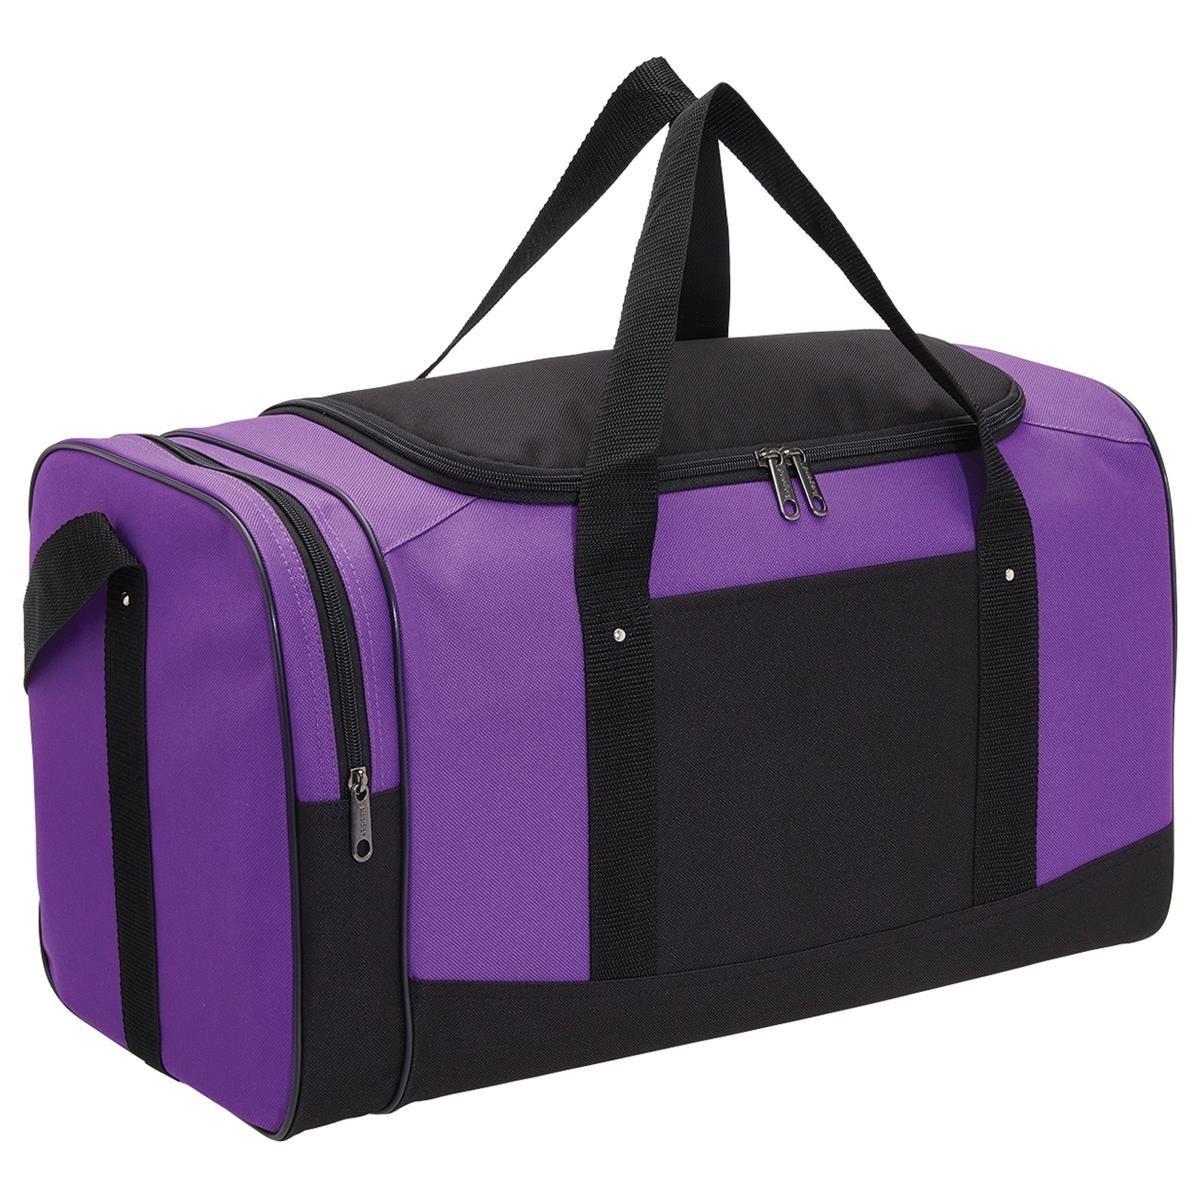 Spark Sports Bag - Purple & Black